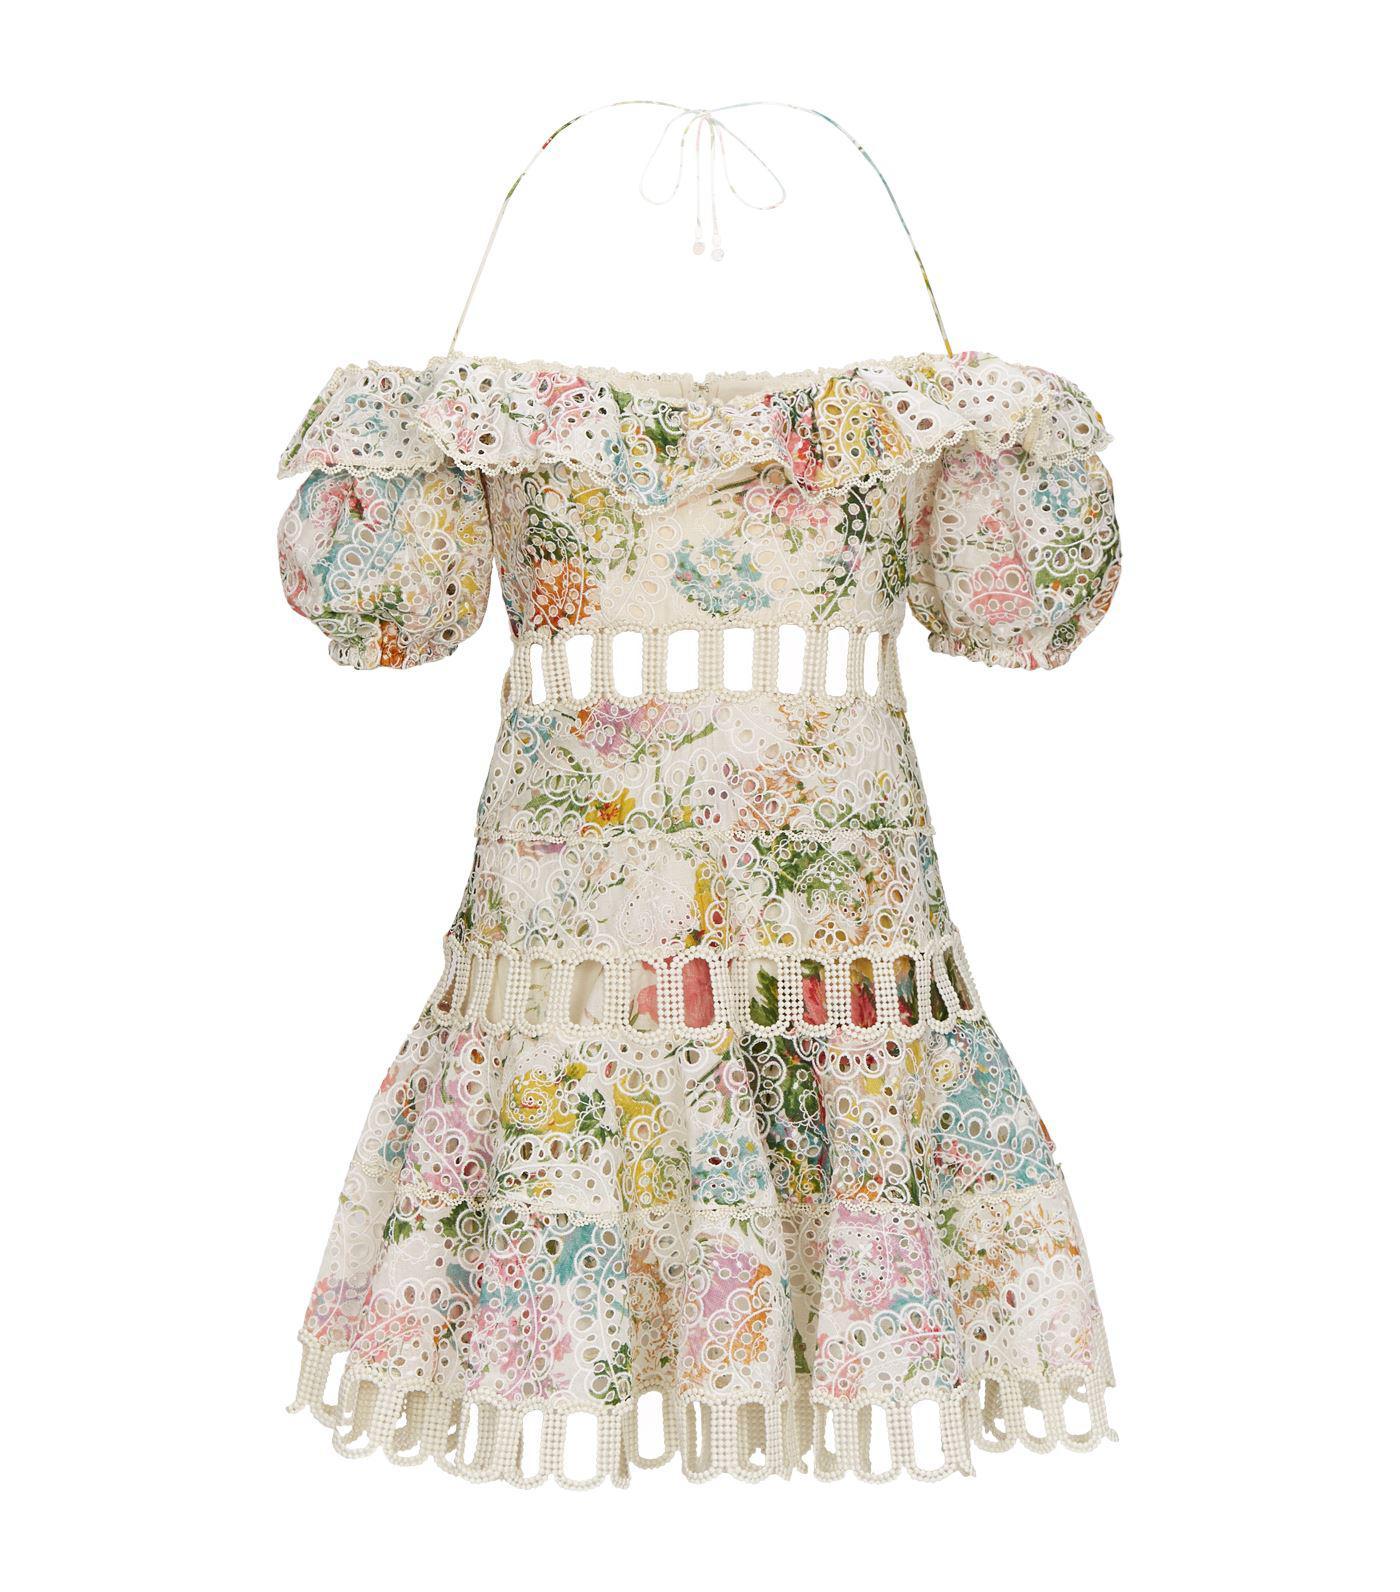 f5197957cfc Zimmermann Heathers Floral Lace Minidress - Save 6% - Lyst